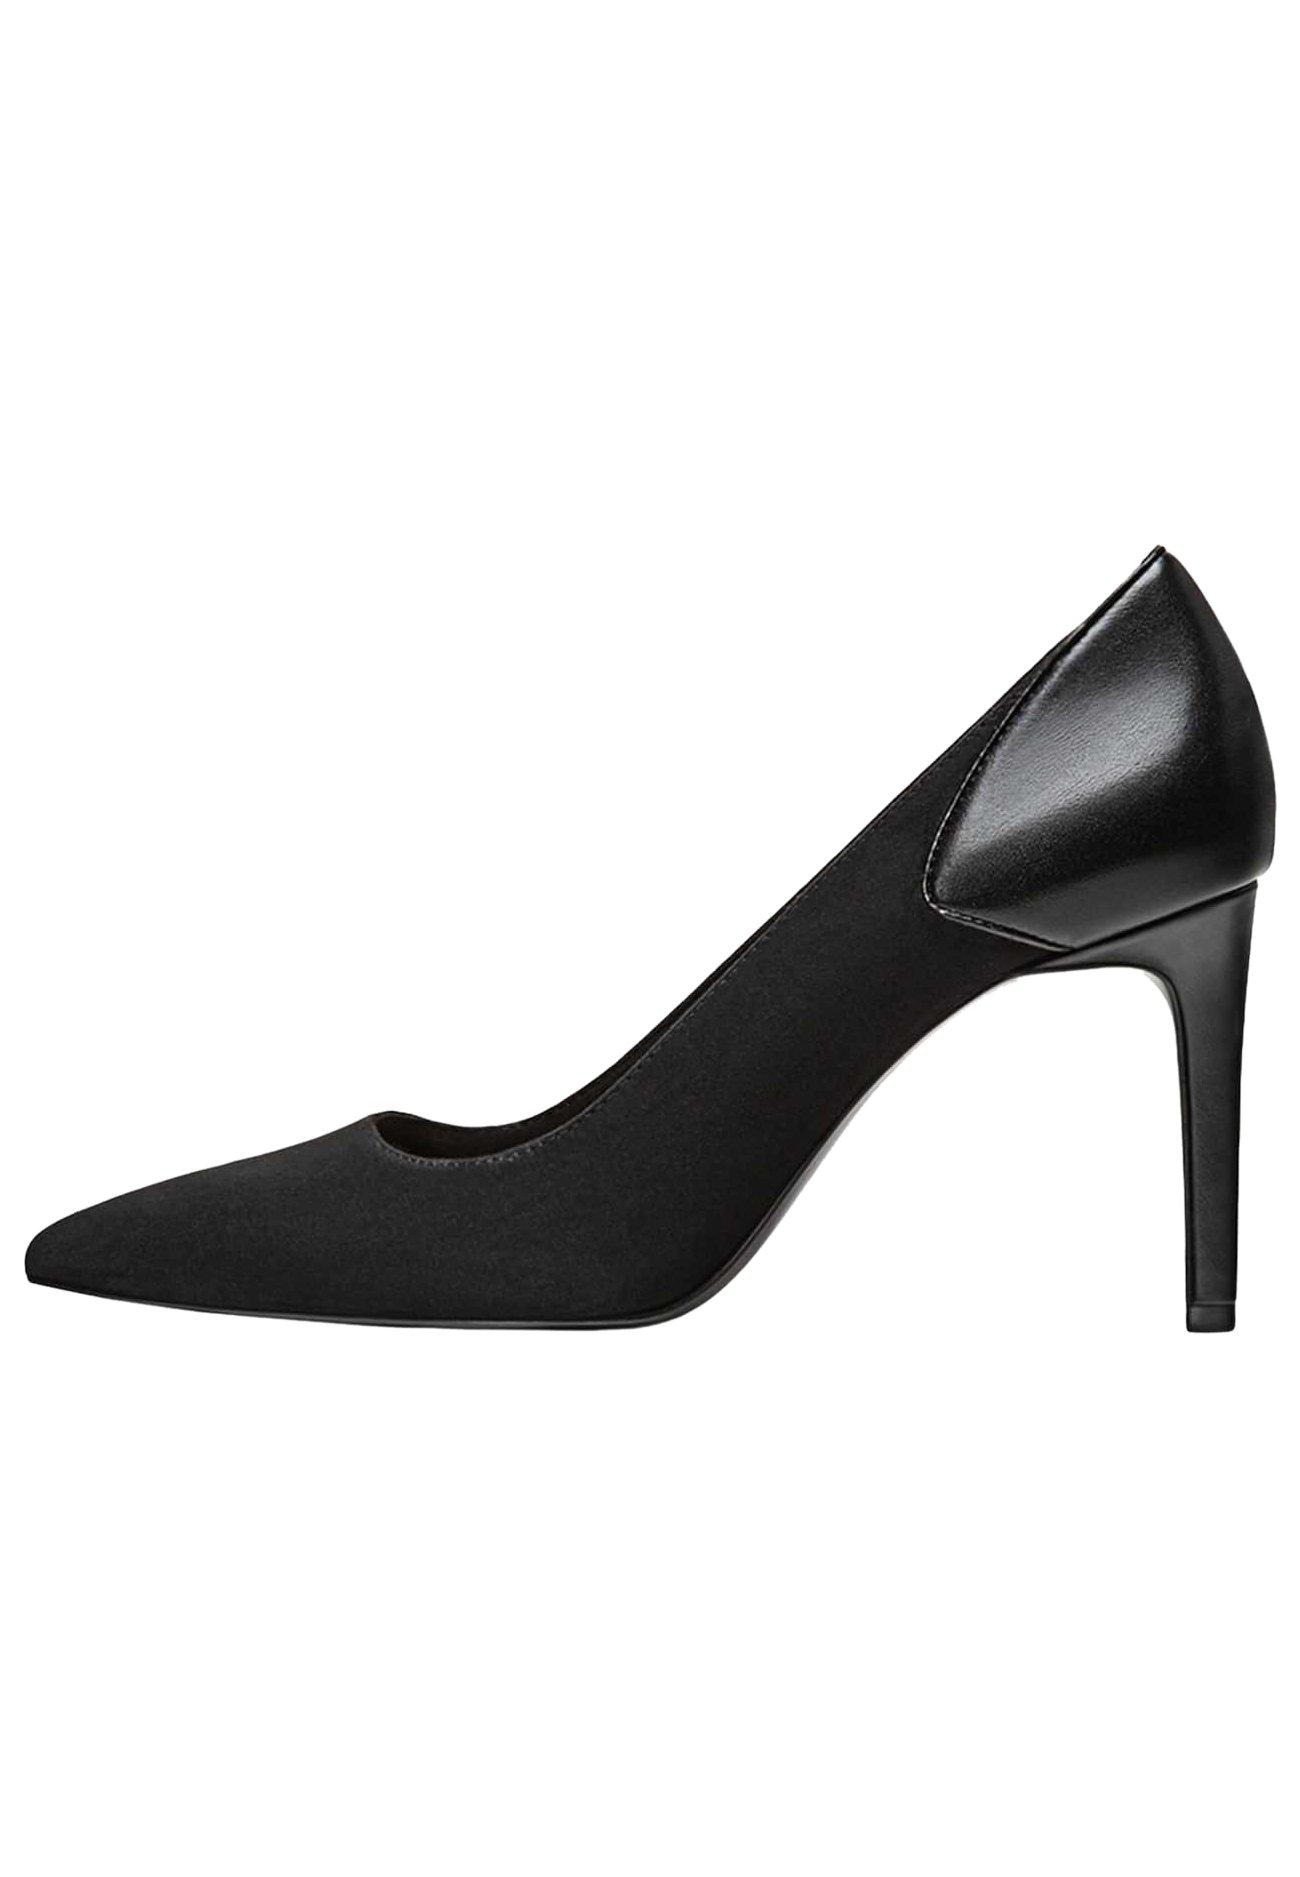 Stradivarius High heels - black